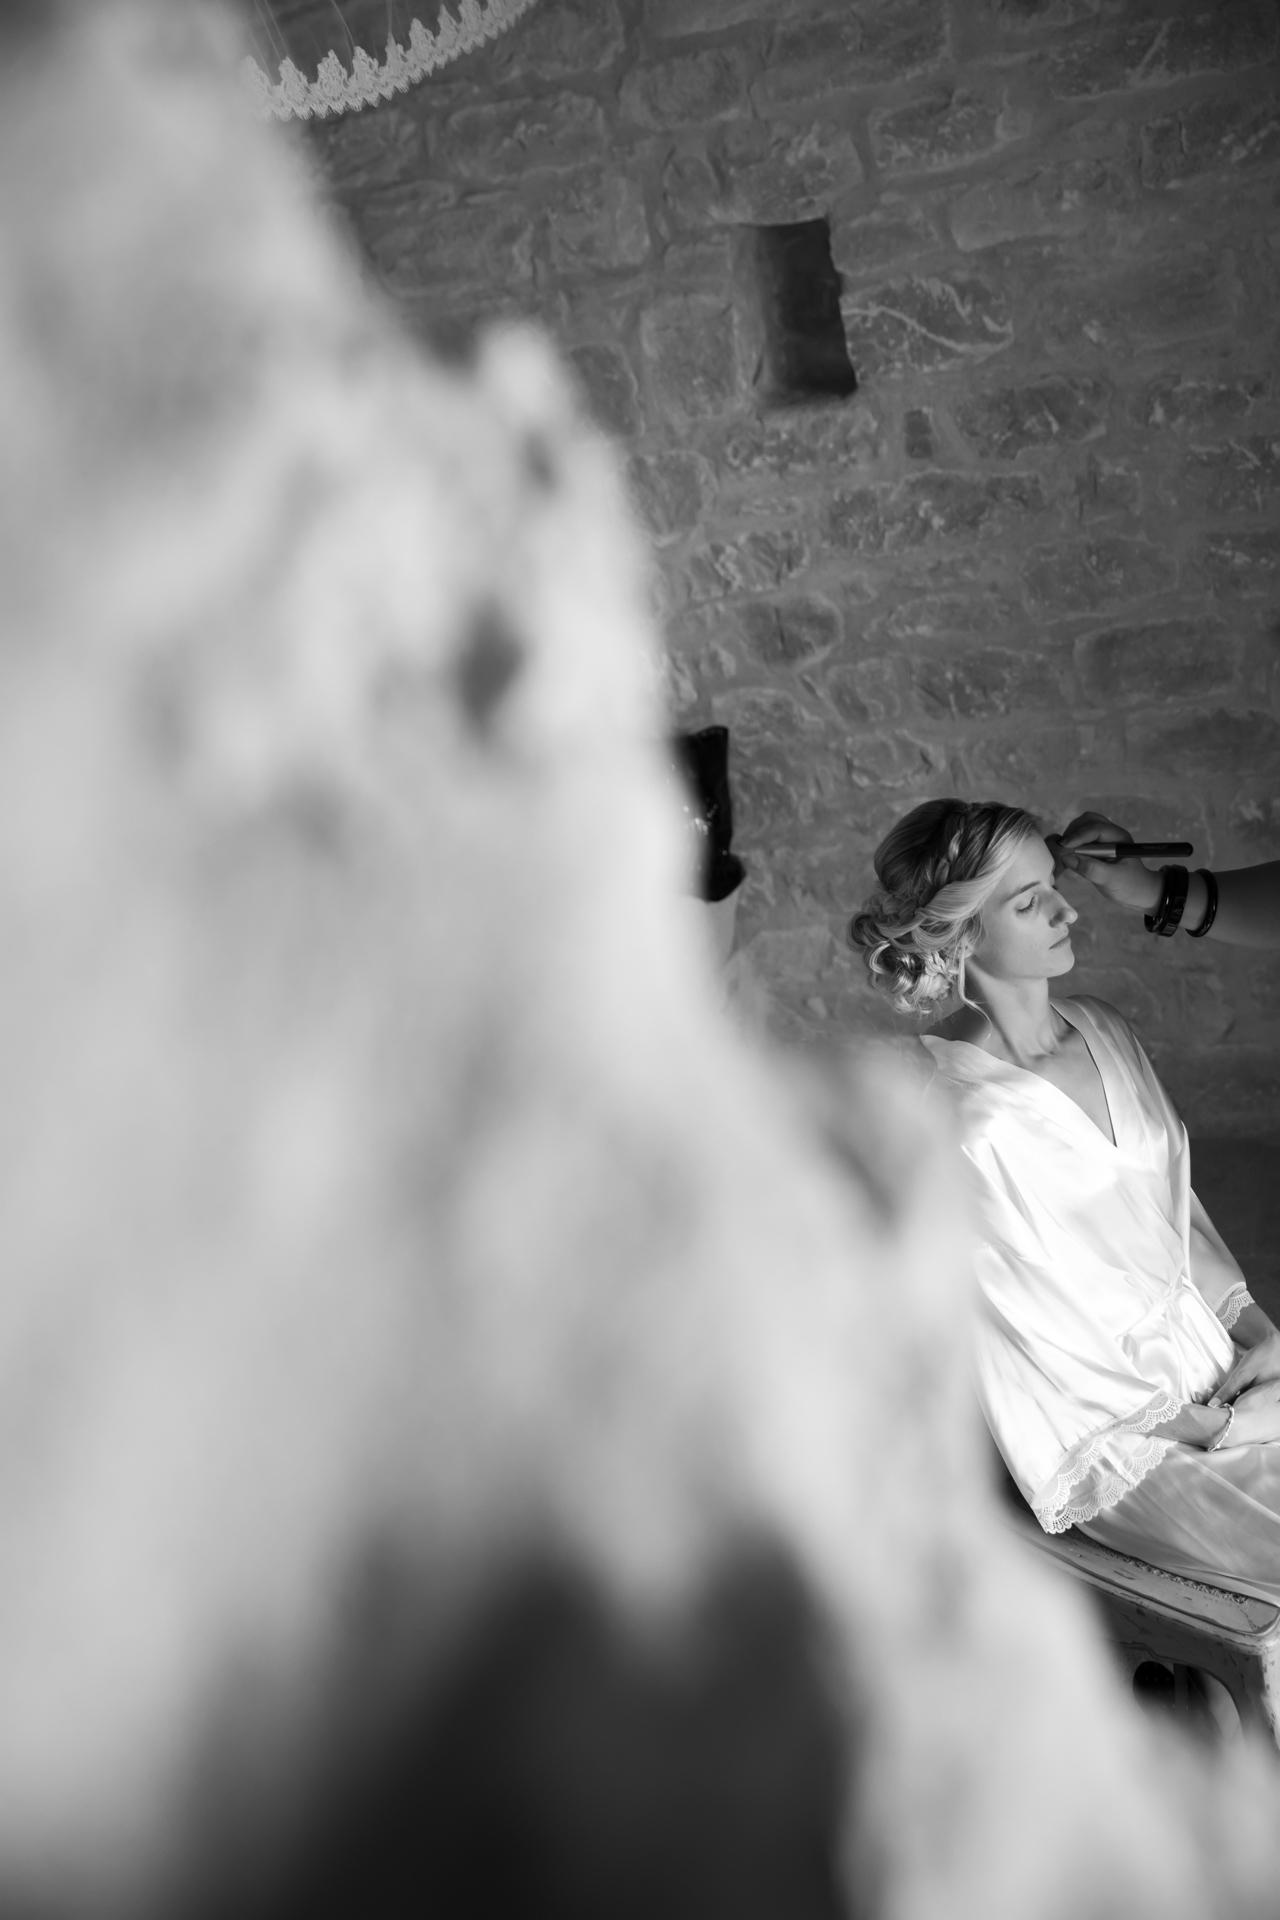 Fotografoi Sparti Fotografoi Spartis φωτογραφοι σπαρτη φωτογραφοι σπαρτης,αλεξανδρακης δημητρης Alexandrakis Alexandrakis Photography (7)